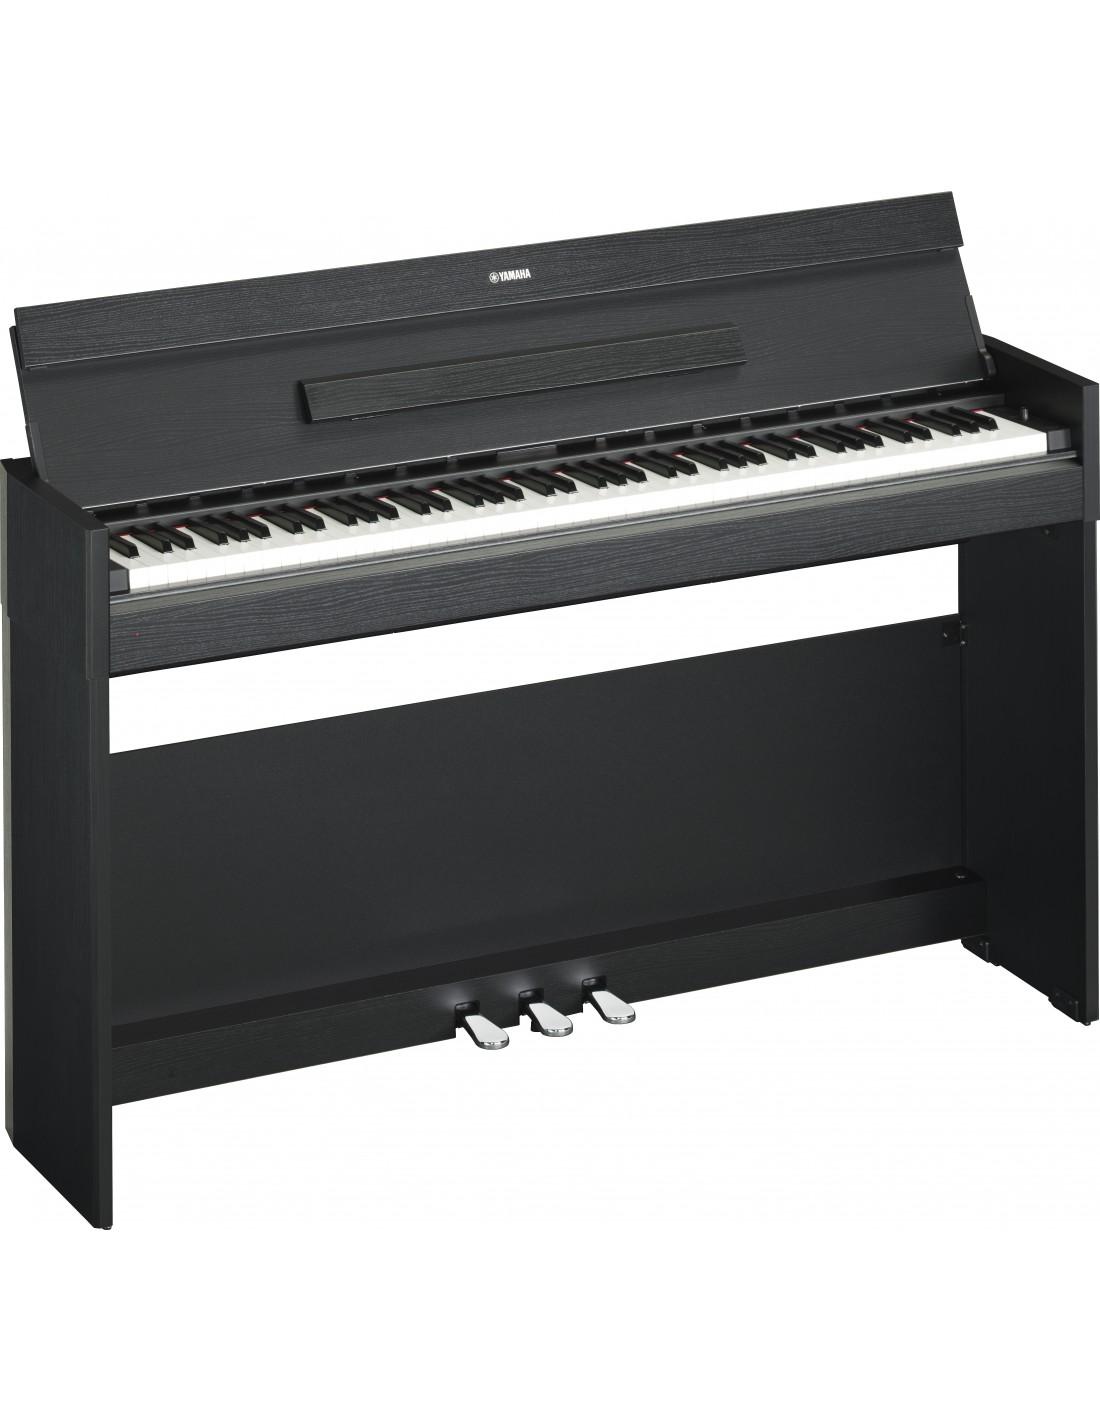 yamaha ydp s52 arius piano num rique 88 notes. Black Bedroom Furniture Sets. Home Design Ideas